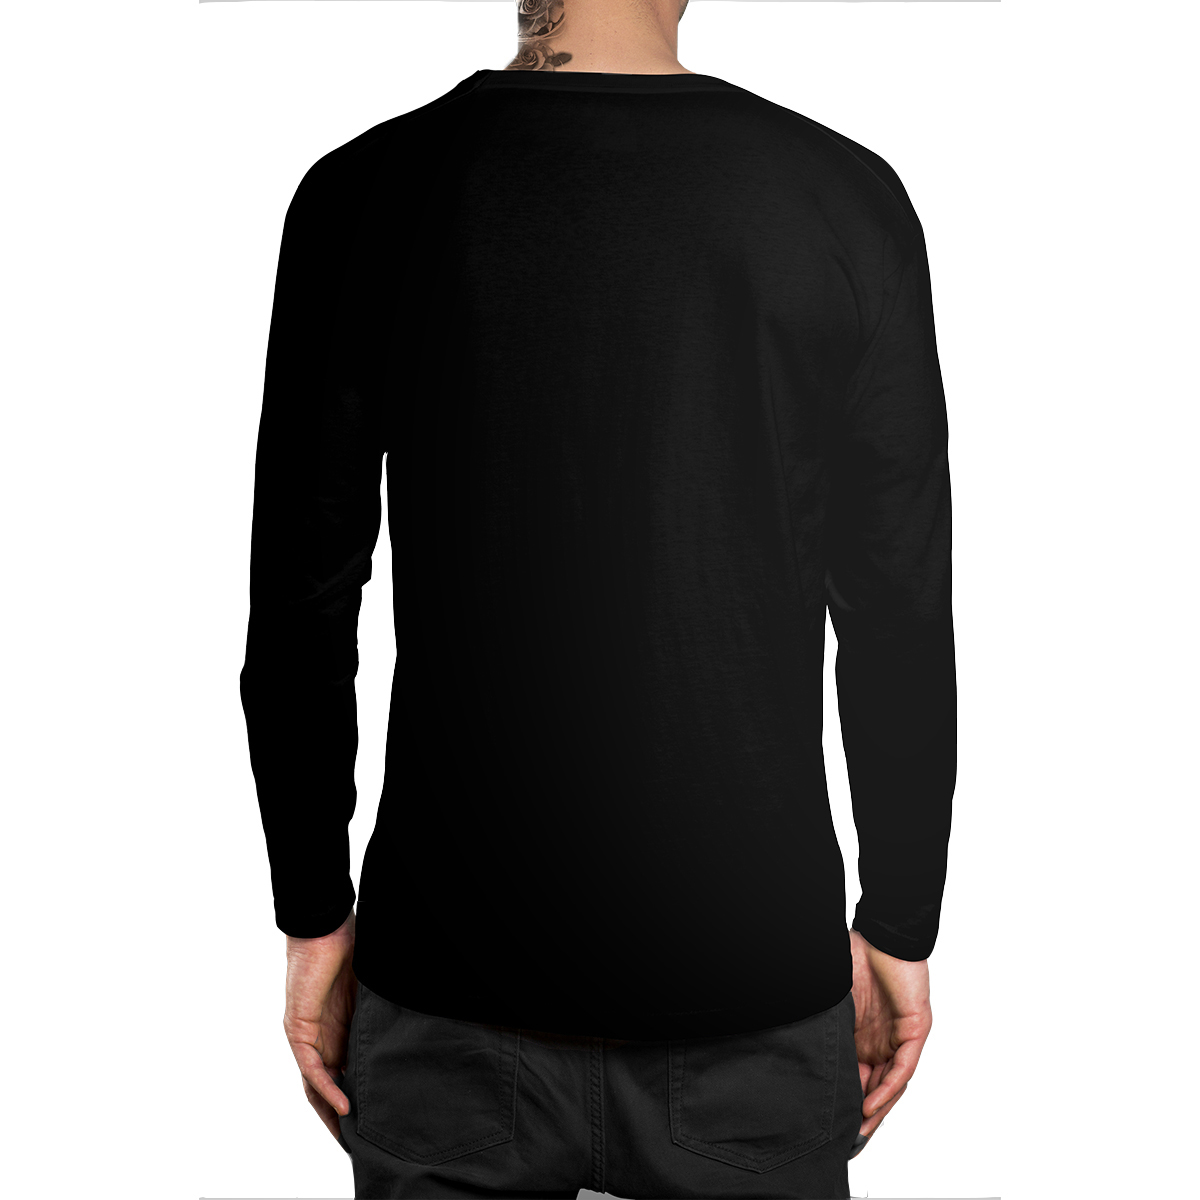 Stompy Camiseta Manga Longa Modelo 49